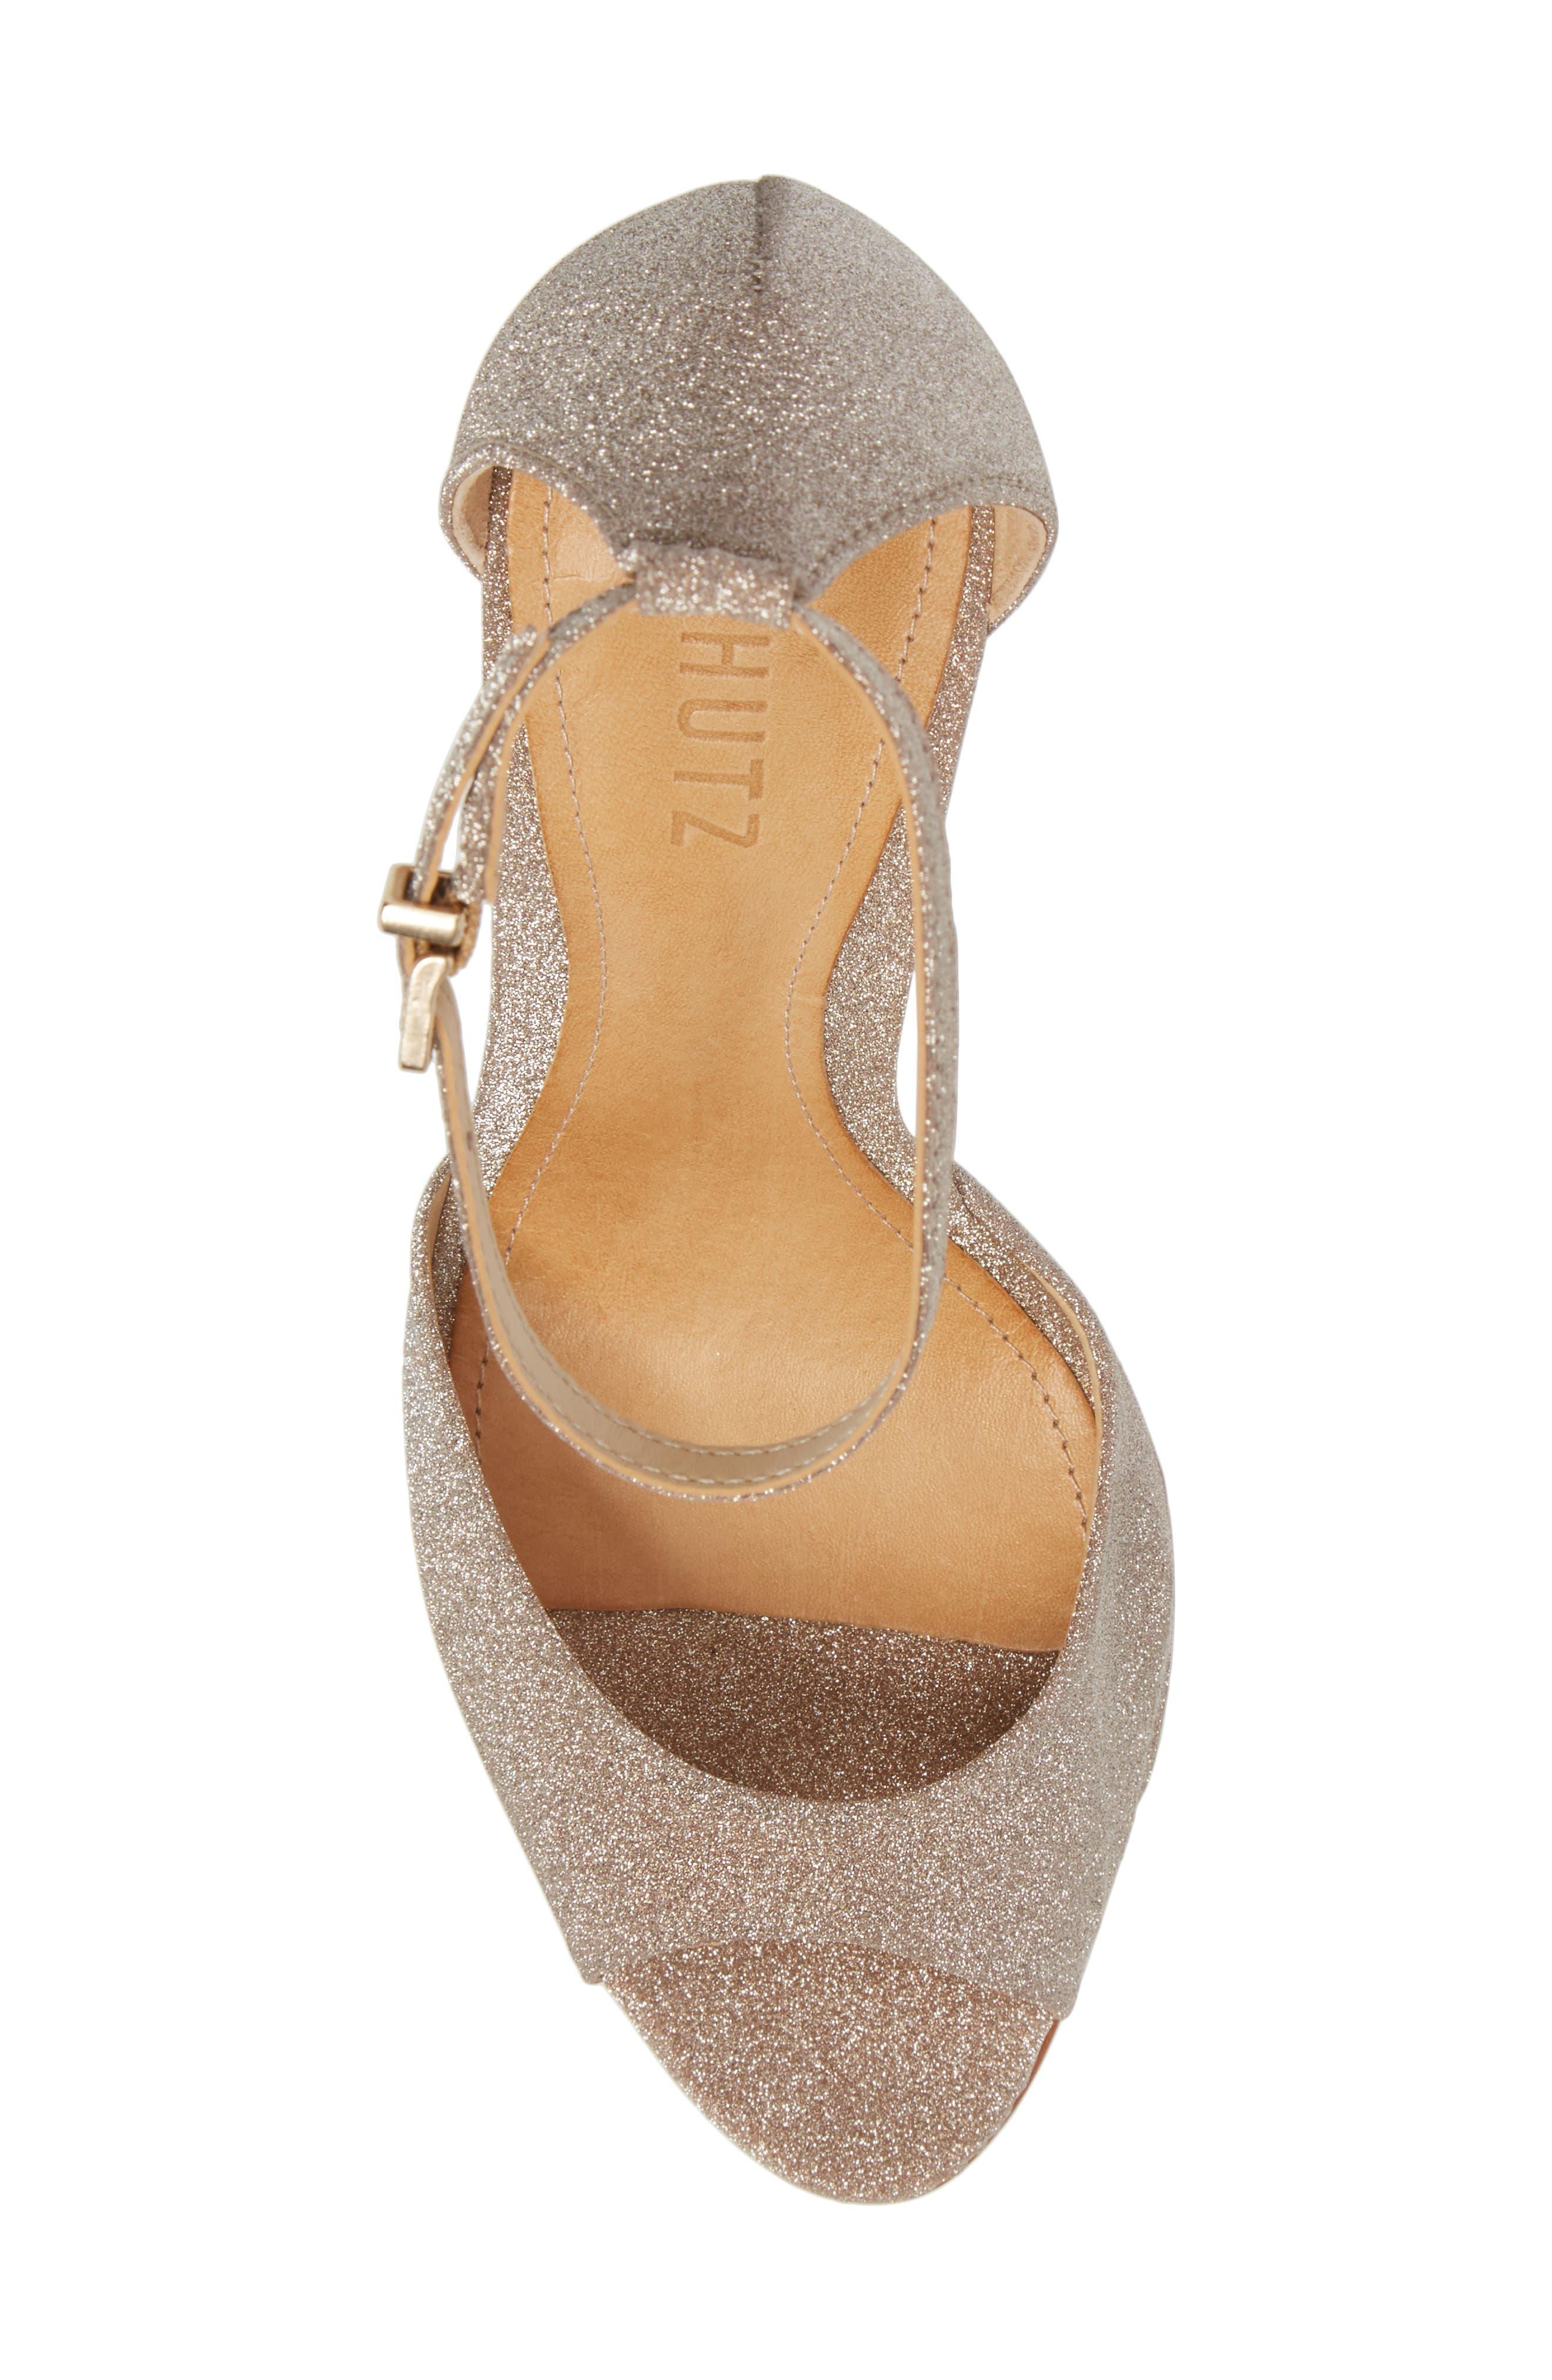 Saasha Lee Ankle Strap Sandal,                             Alternate thumbnail 5, color,                             040